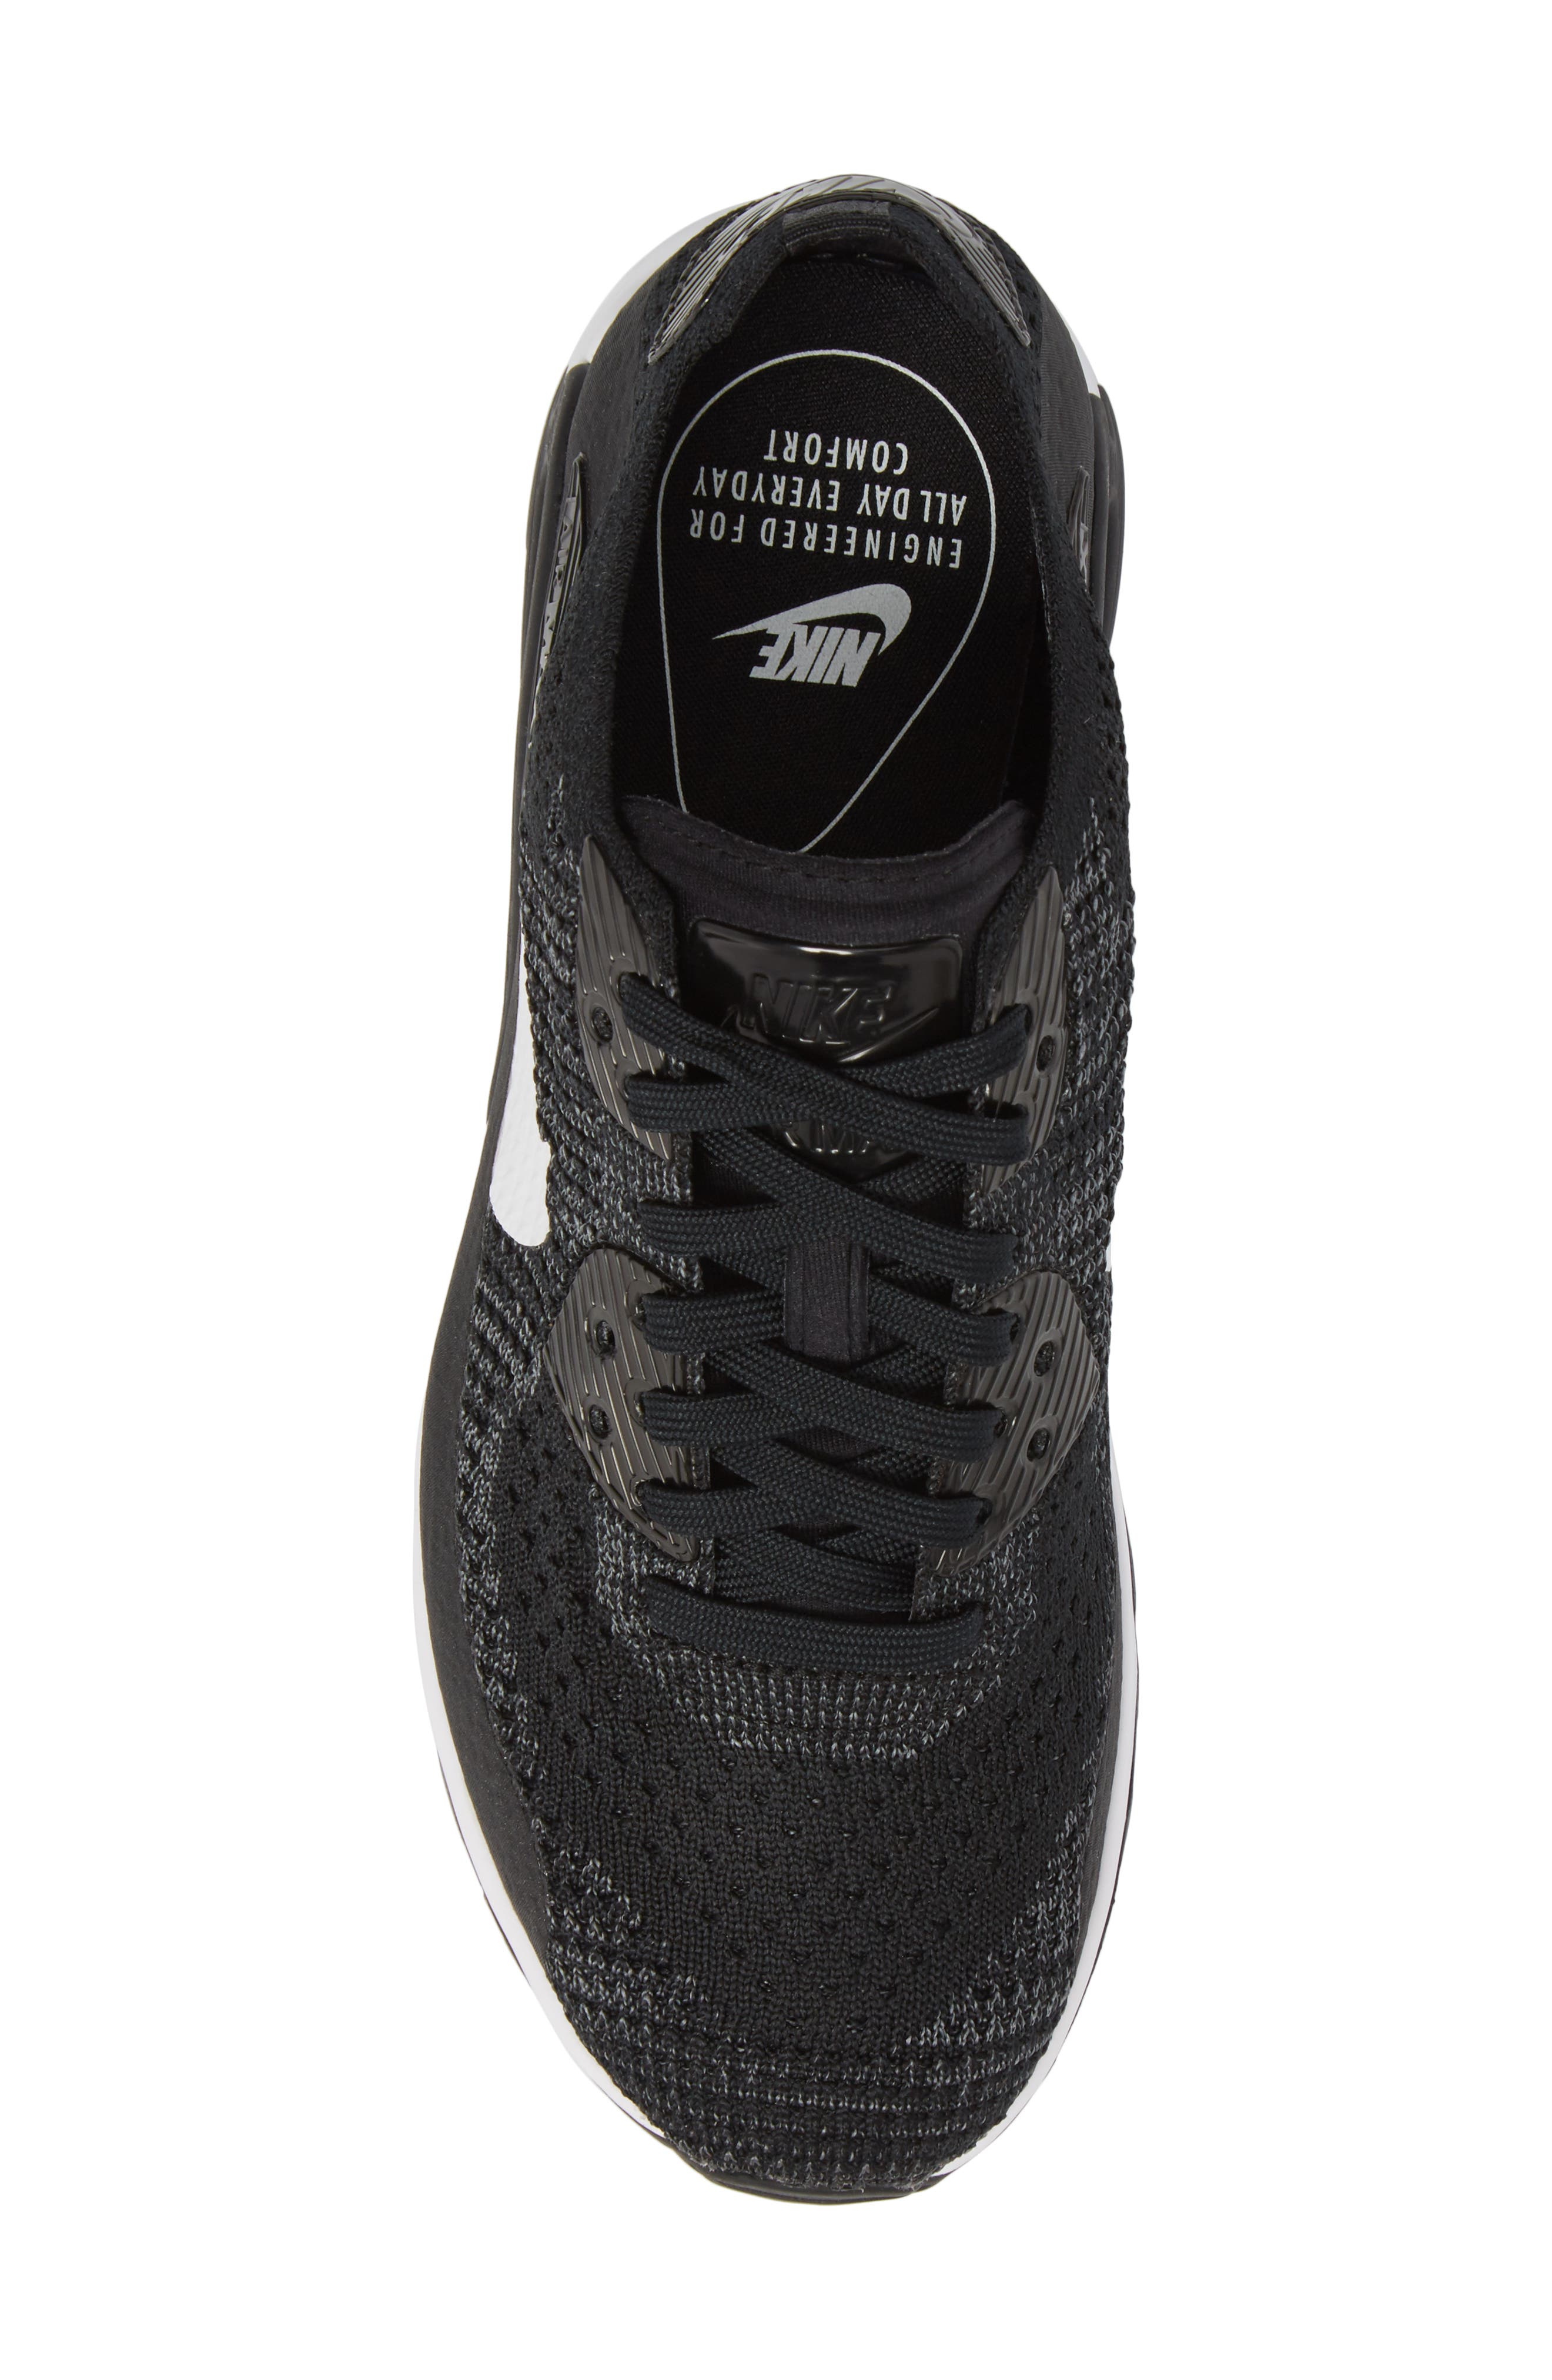 NIKE,                             Air Max 90 Flyknit Ultra 2.0 Sneaker,                             Alternate thumbnail 5, color,                             004